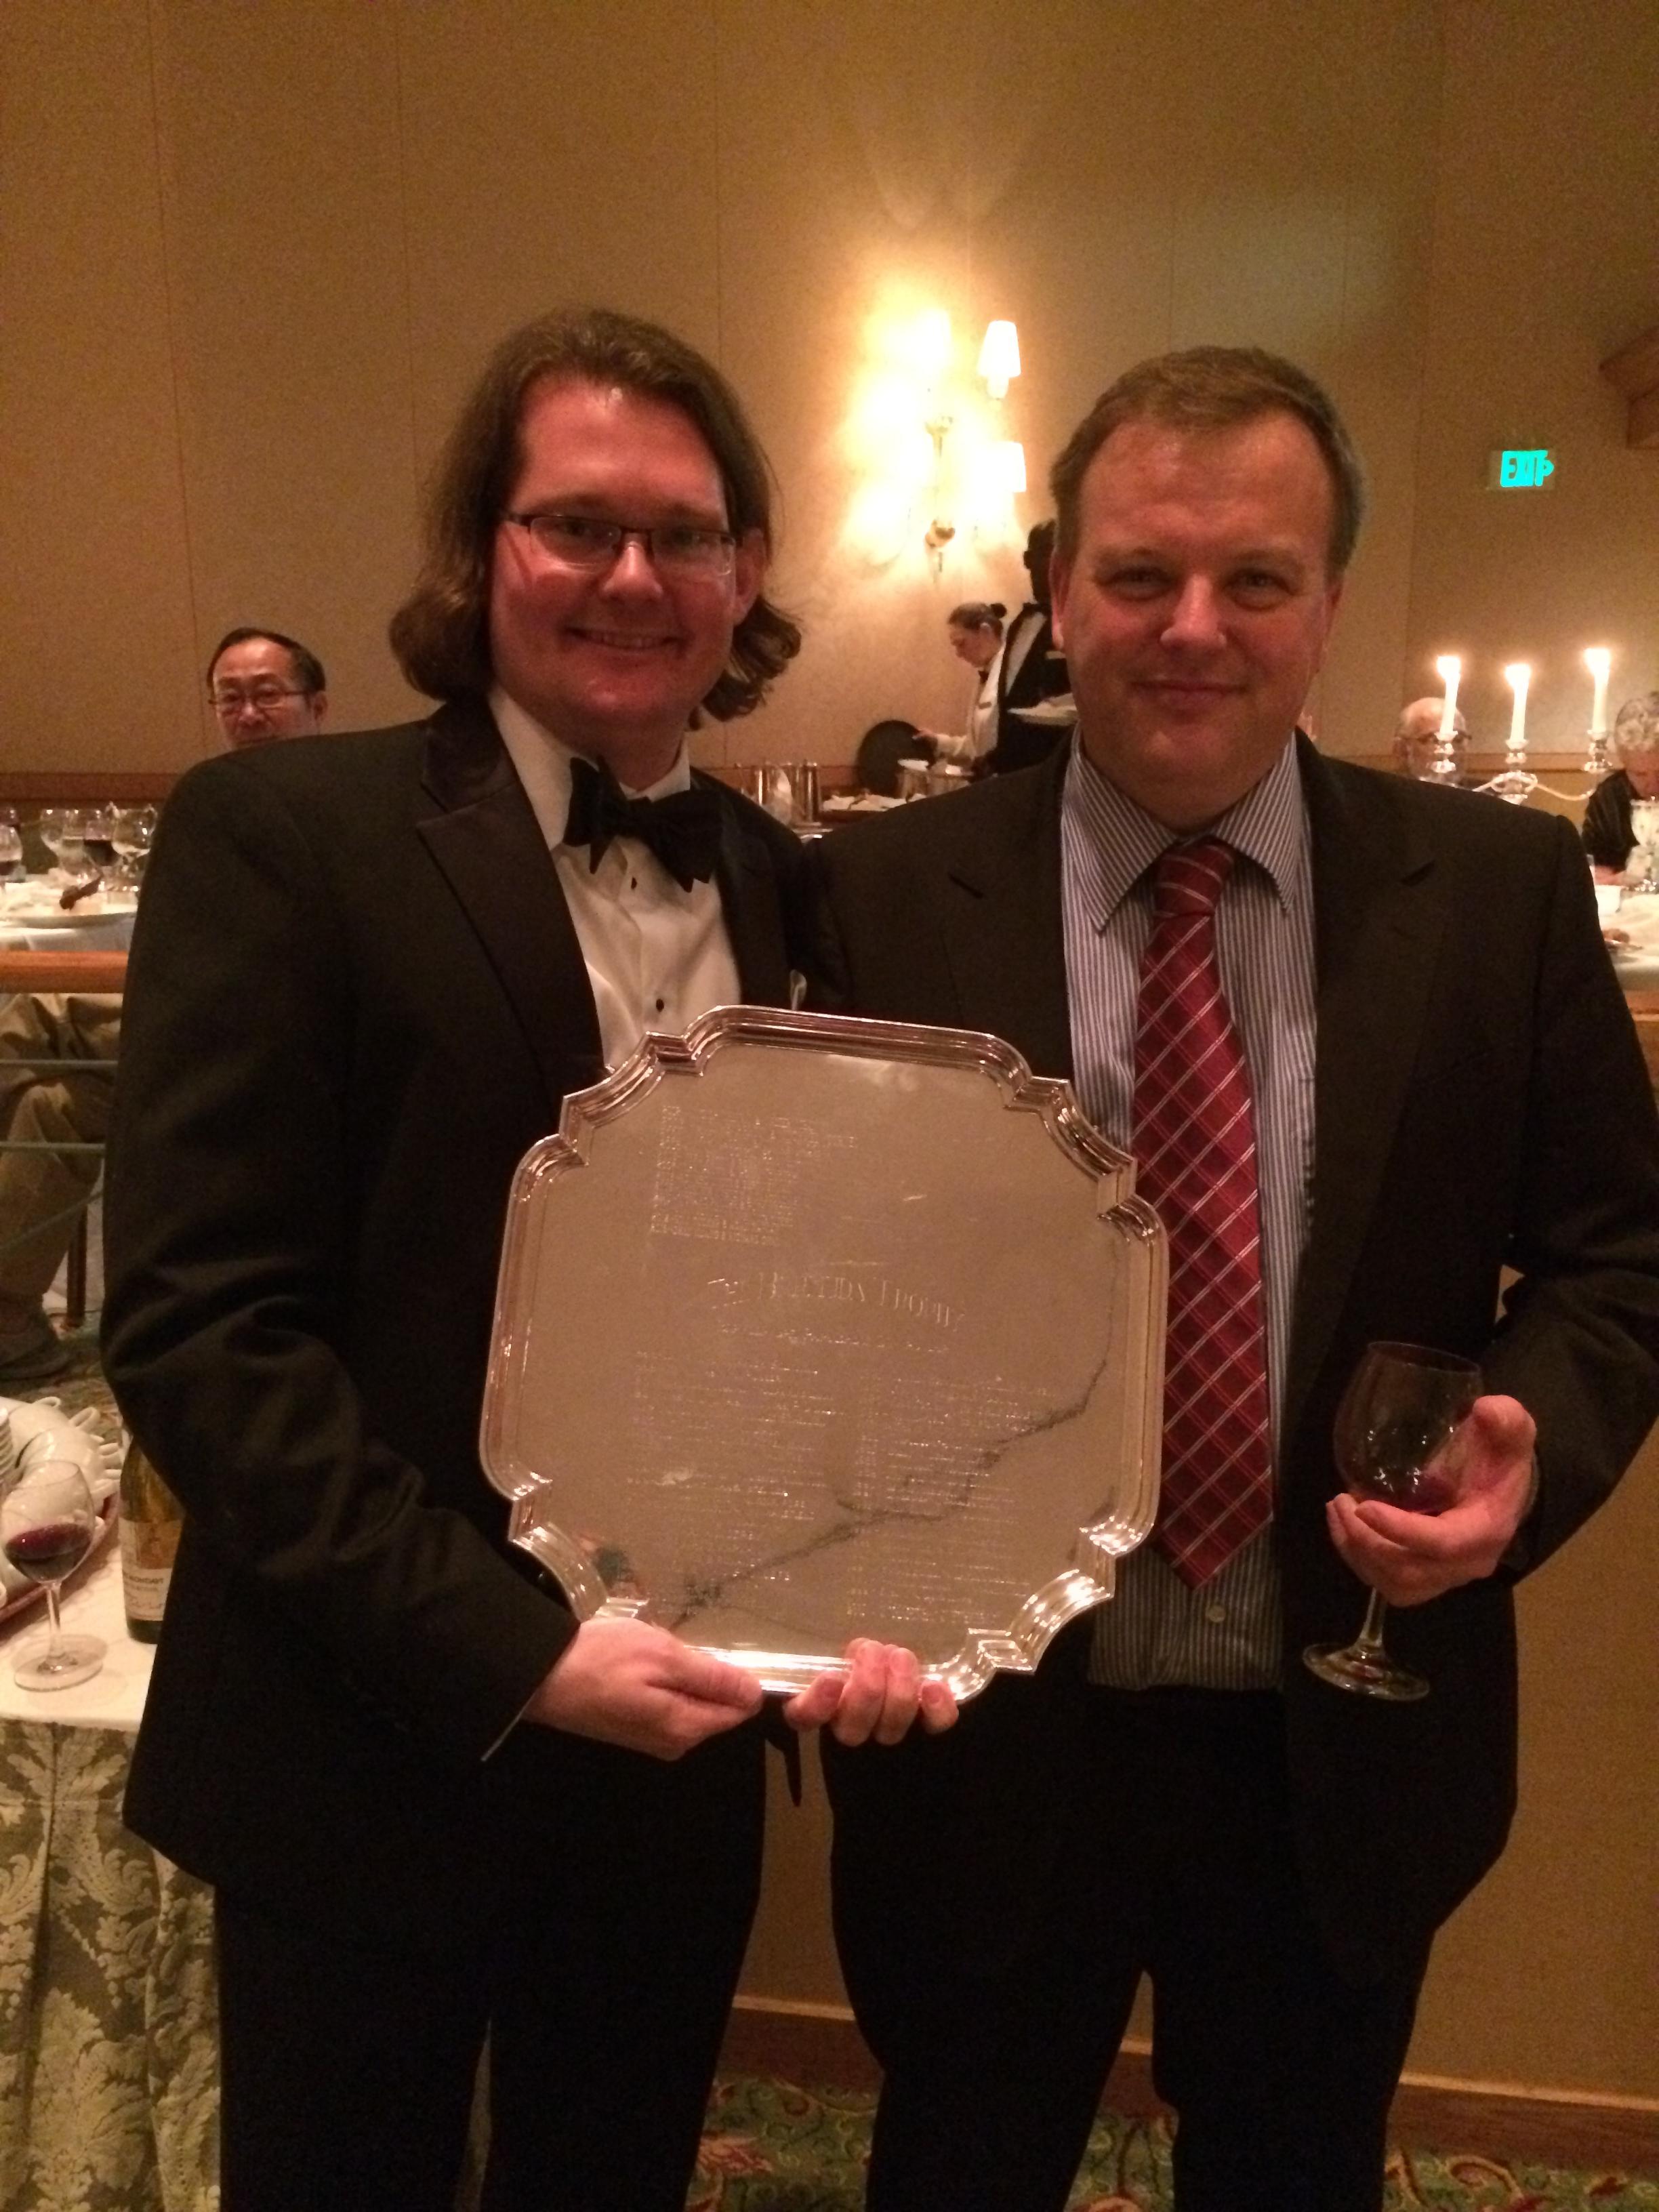 Robert and John Glynn with Bermuda Pairs Trophy